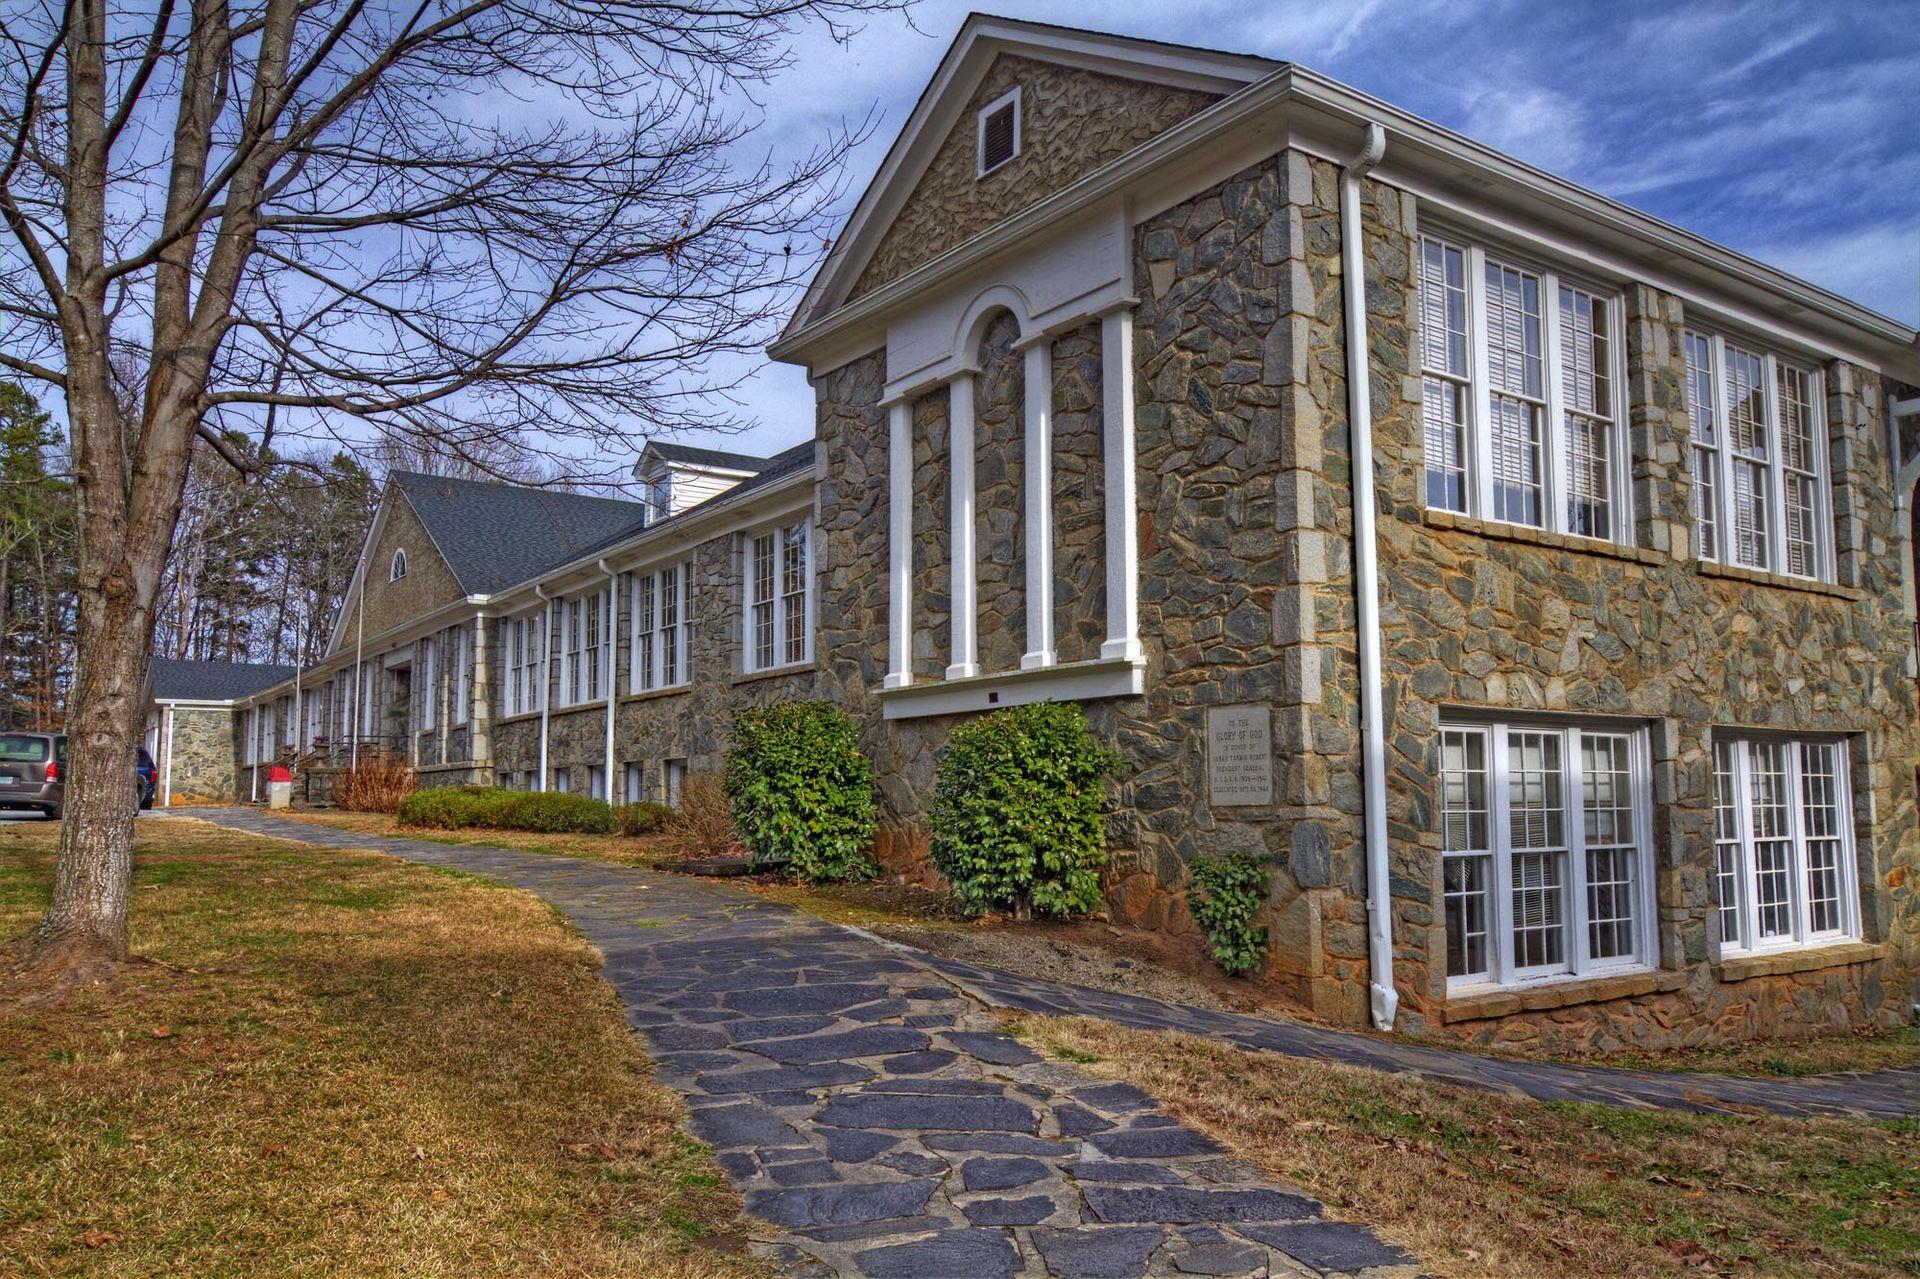 Sc School Of The Arts  Treasure Island